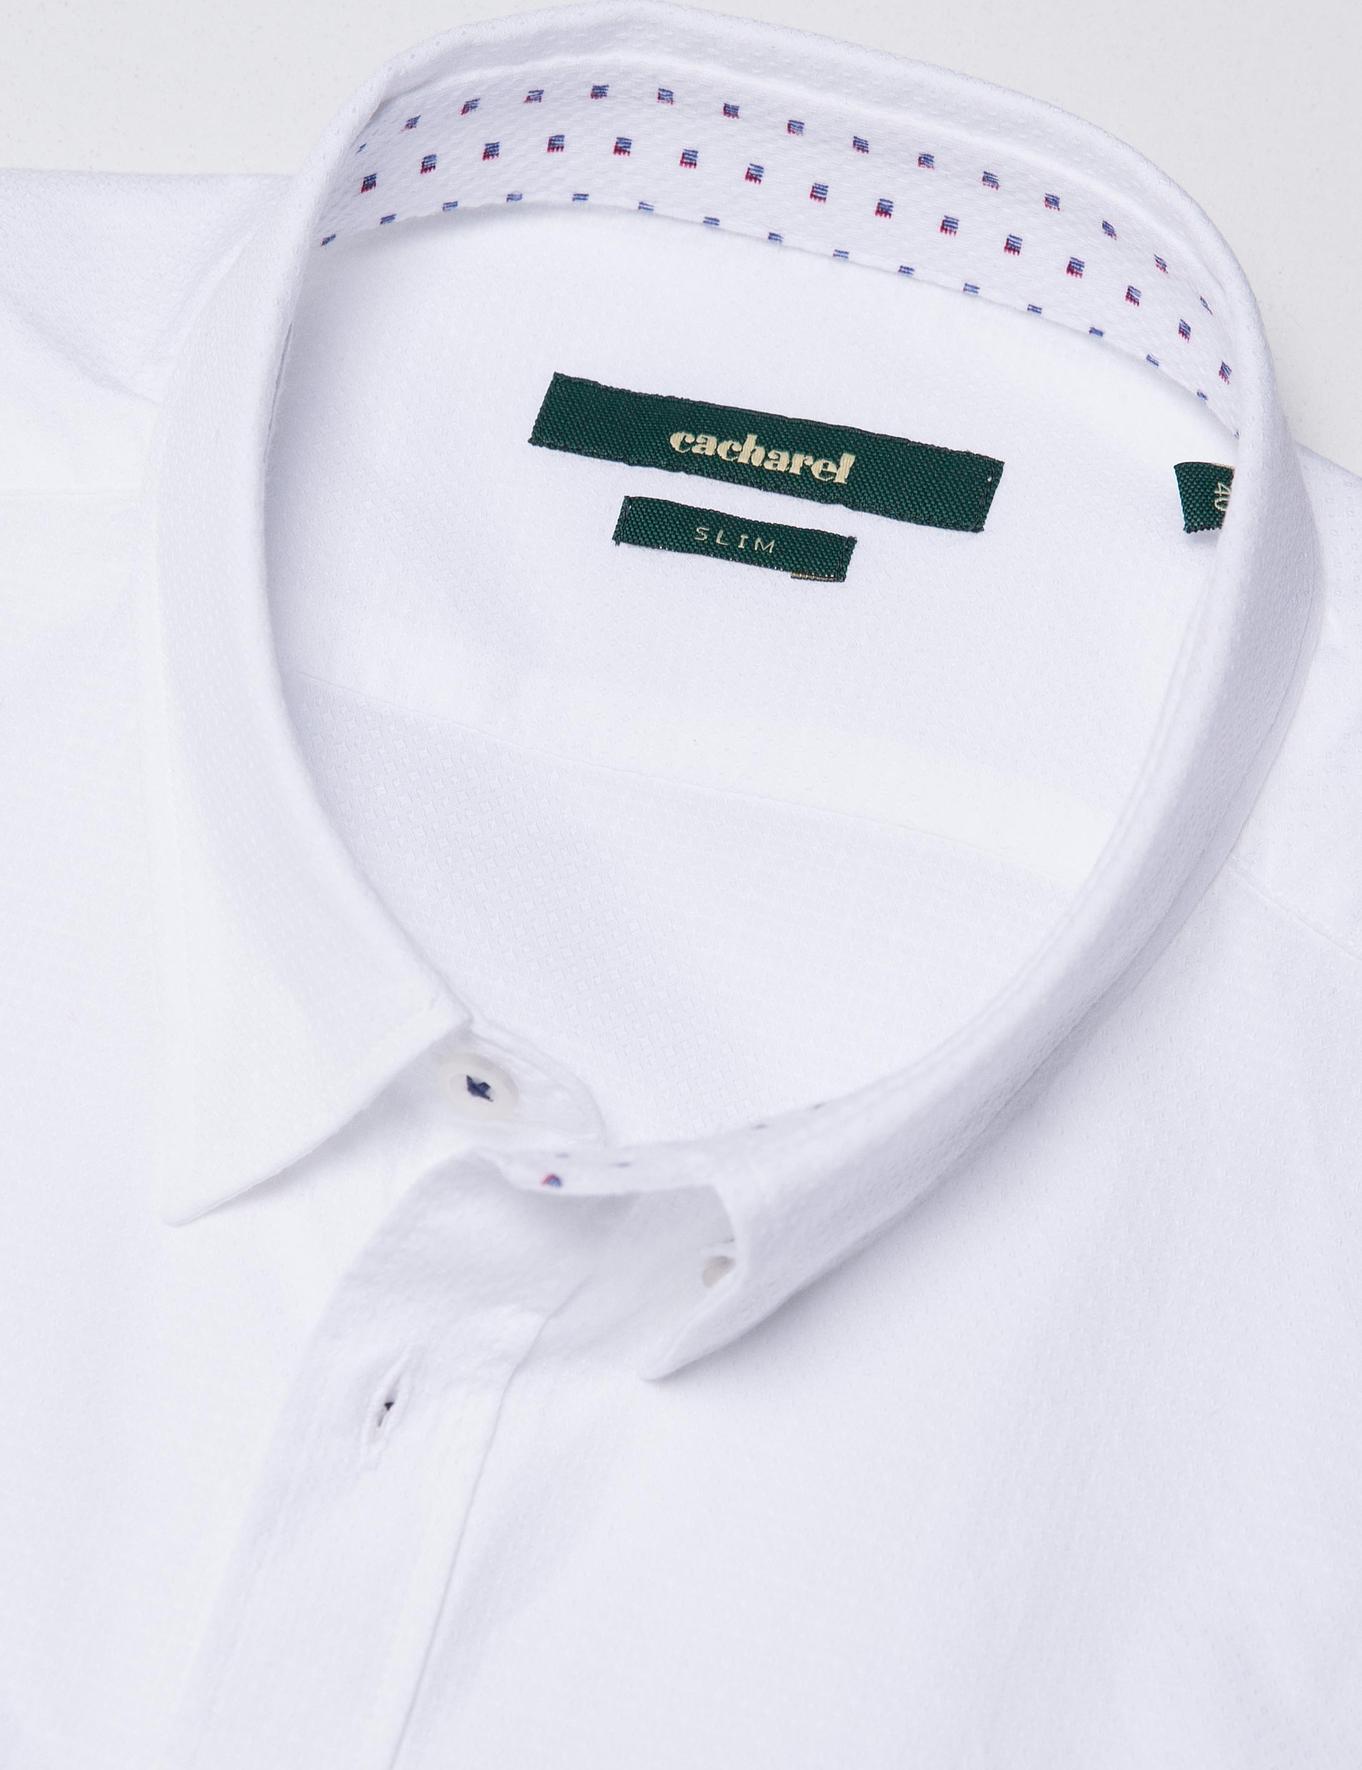 Beyaz Slim Fit Gömlek - 50185886020